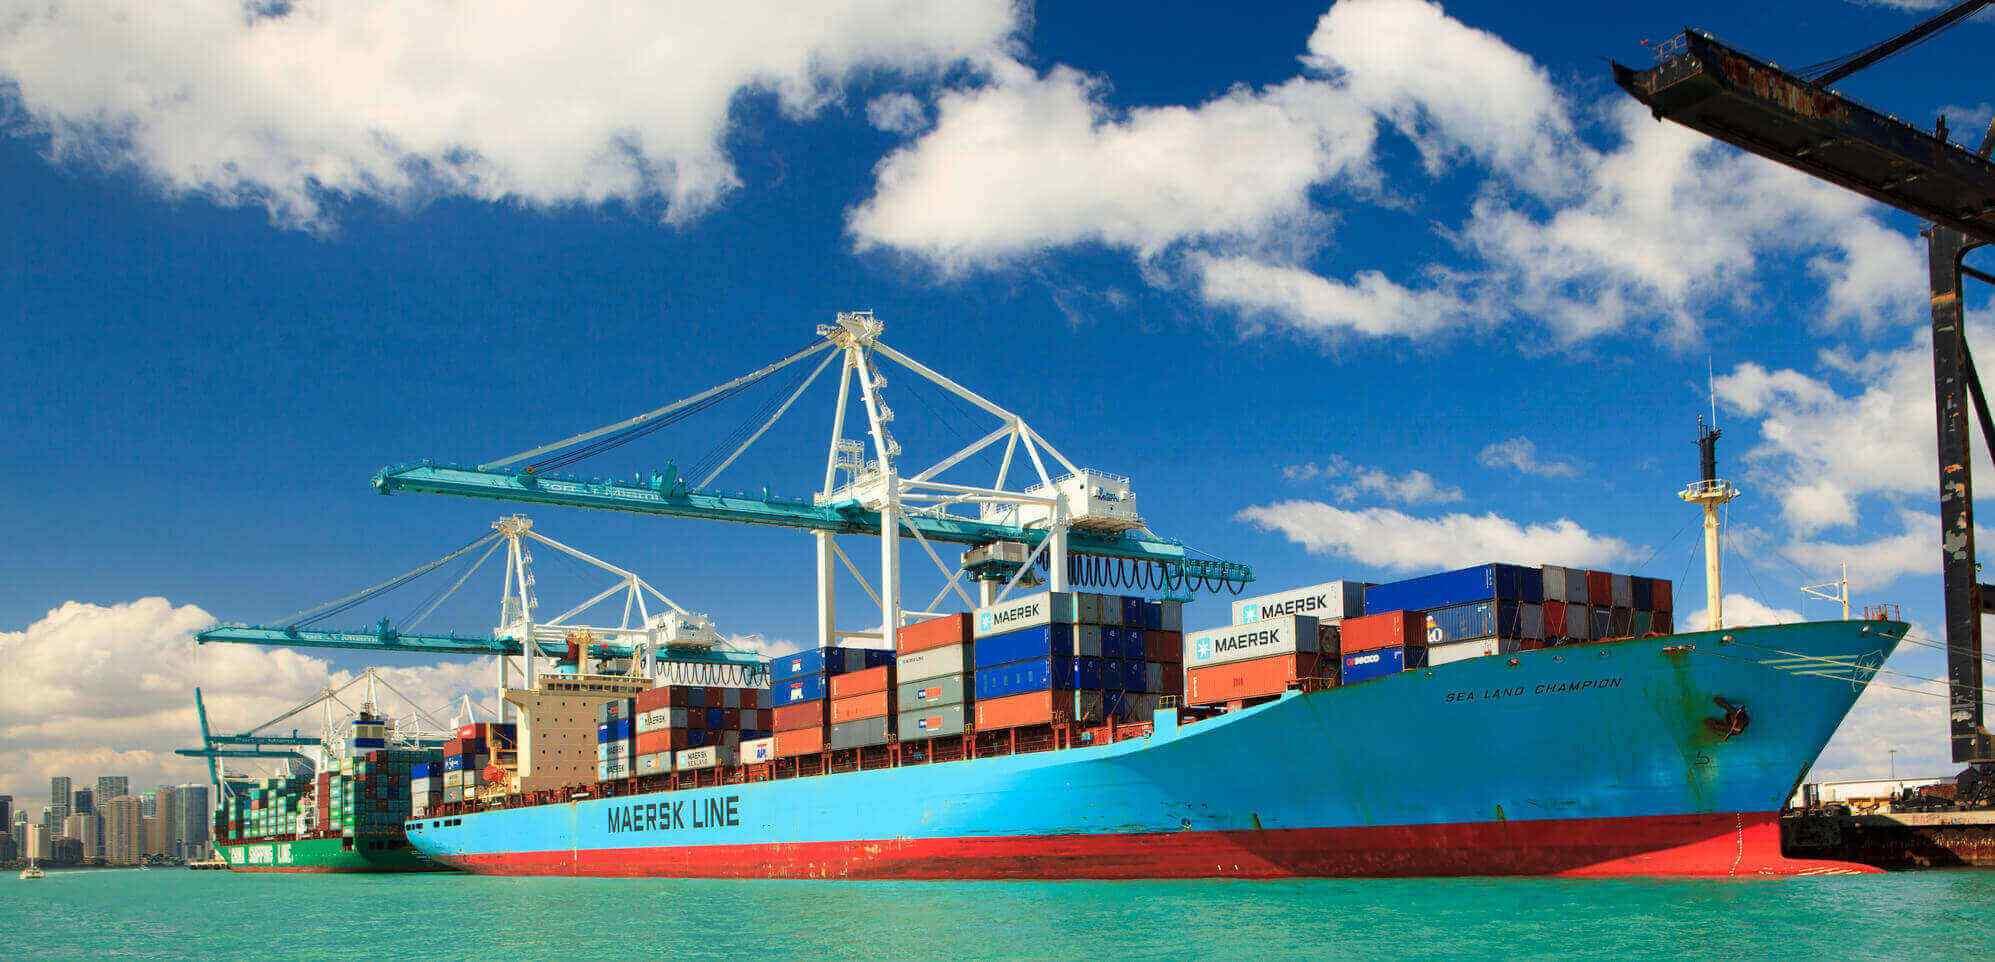 Maersk-Vessel-in-Harbor